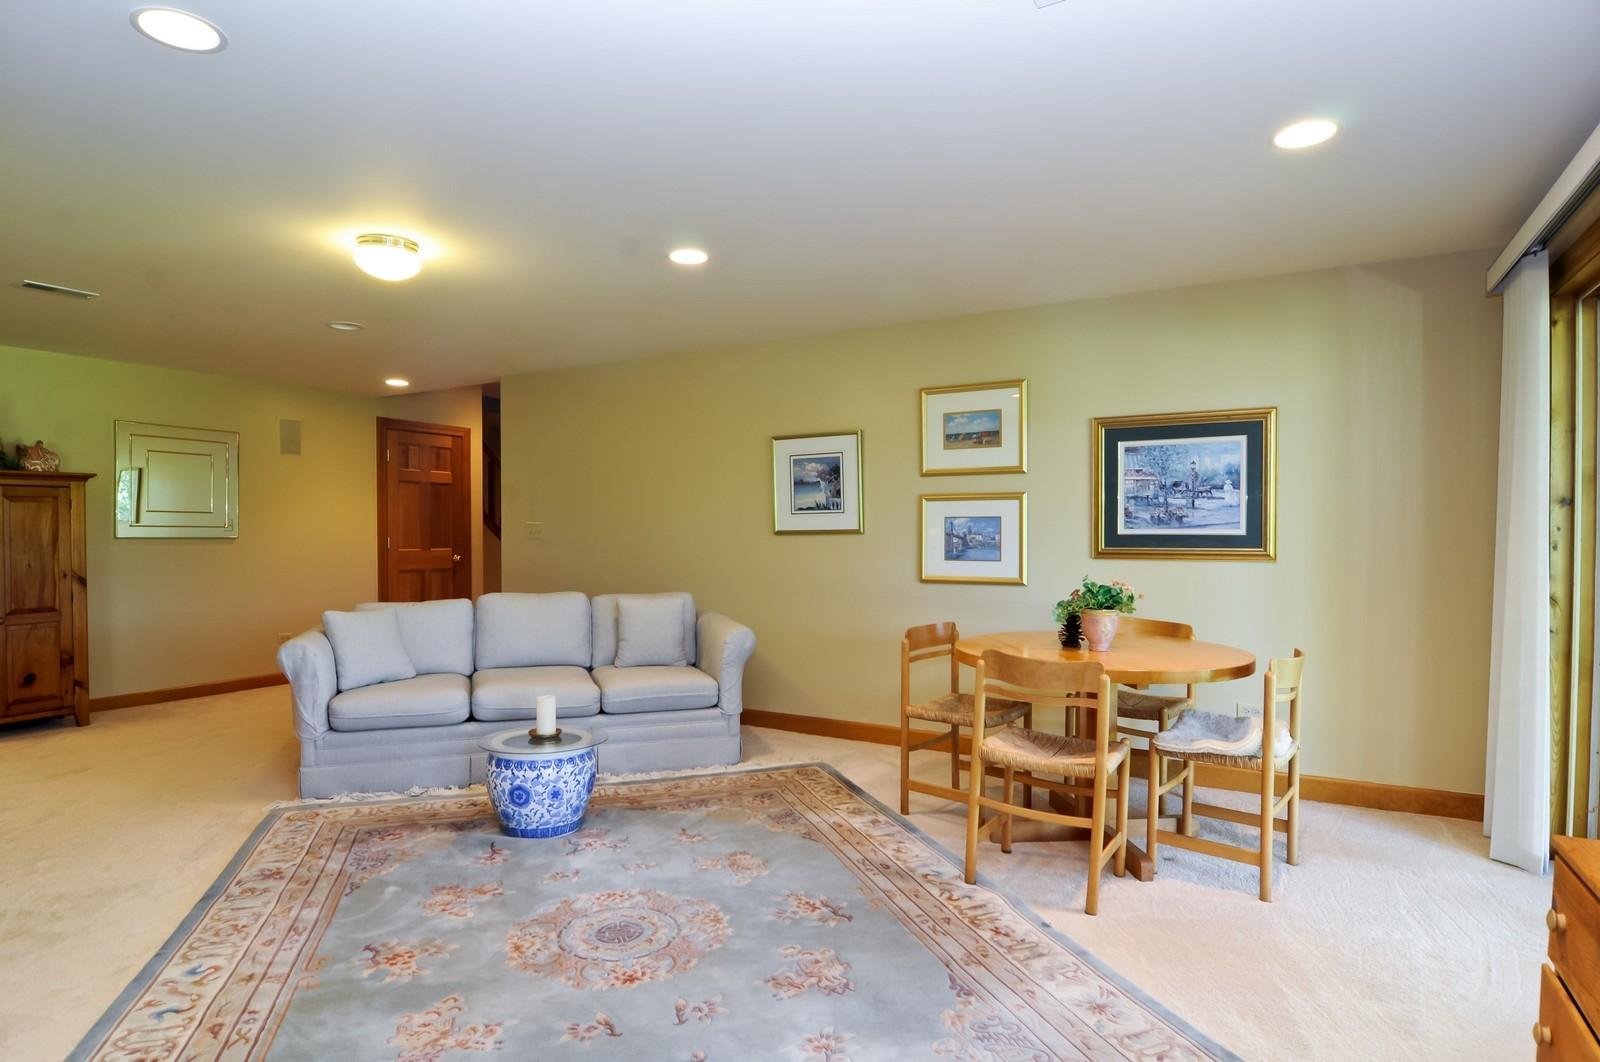 Real Estate Photography - 22822 Glenhurst Rd, Deer Park, IL, 60010 - Lower Level